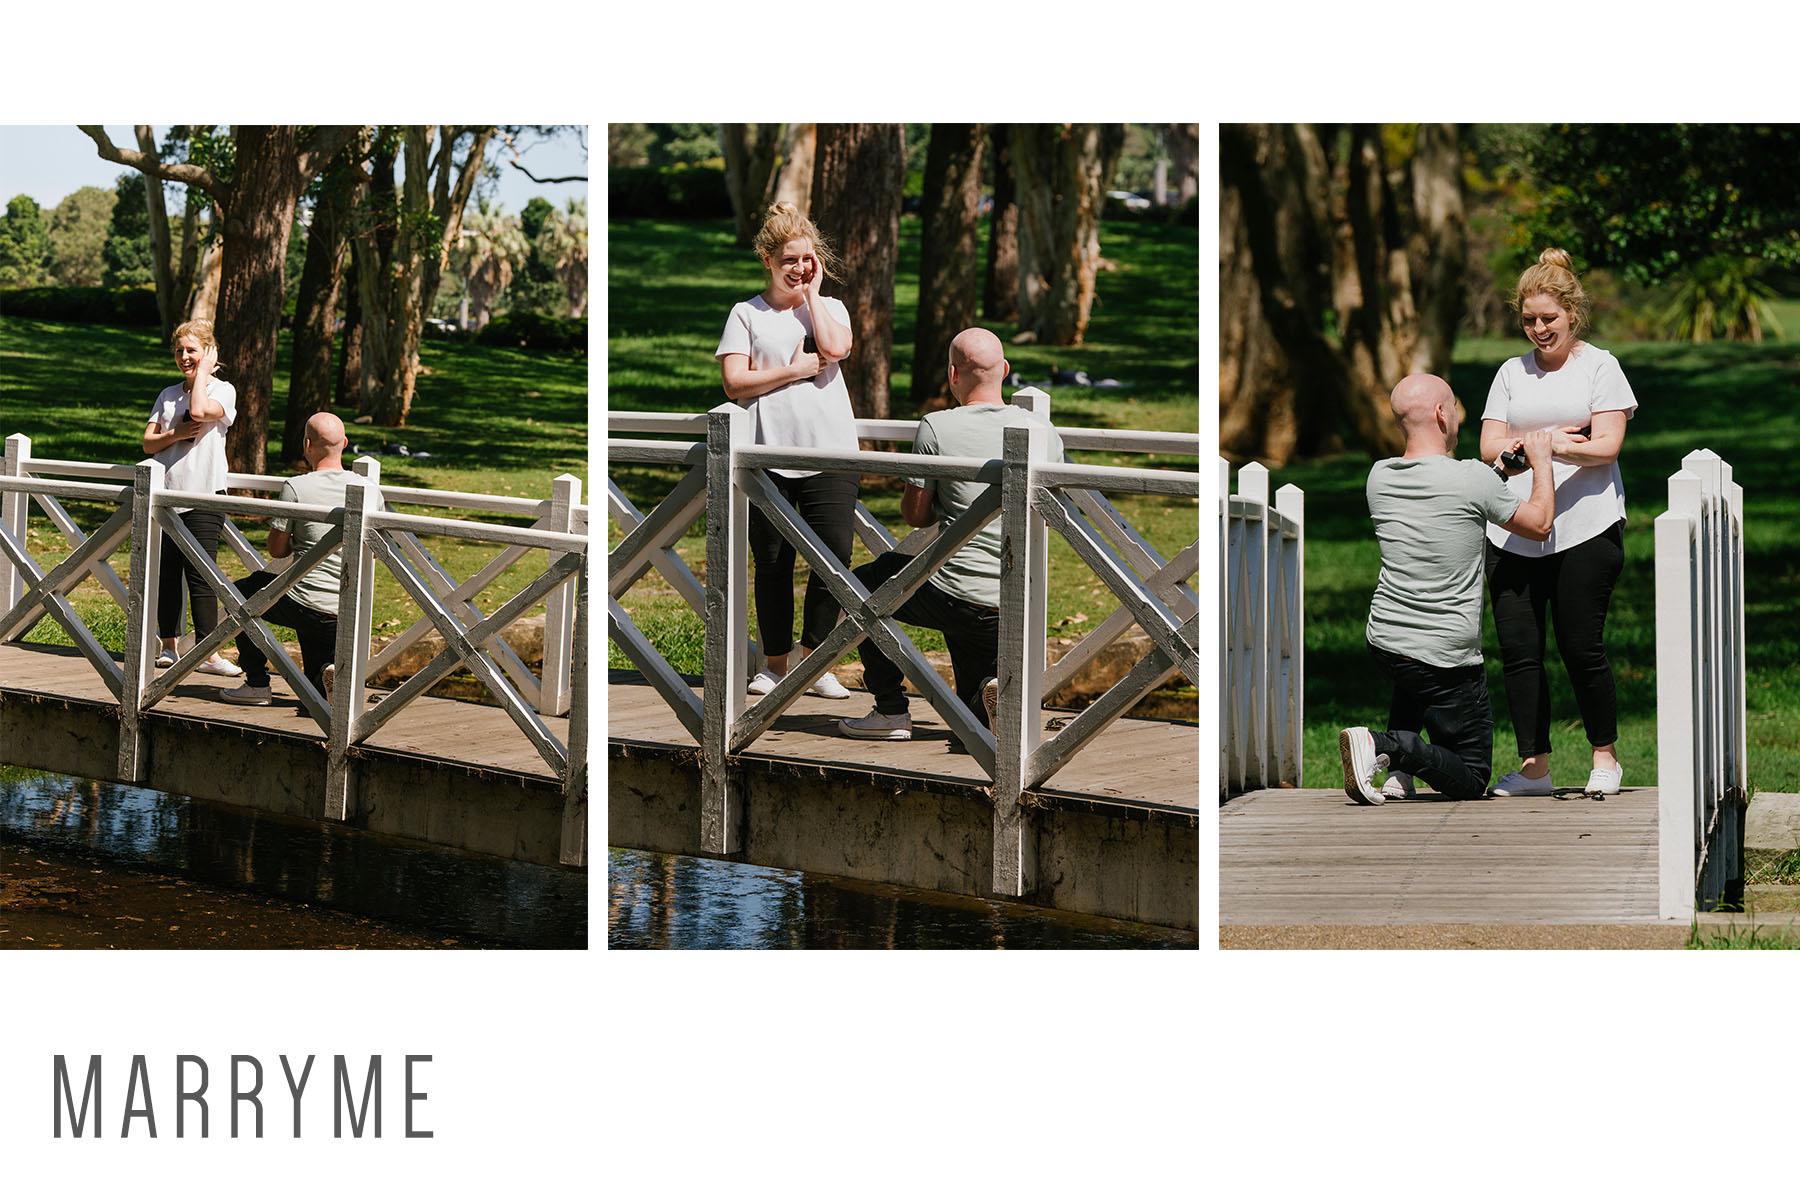 3_Centennial_Park_Parklands_marriage_proposal_sydney_marryme.jpg